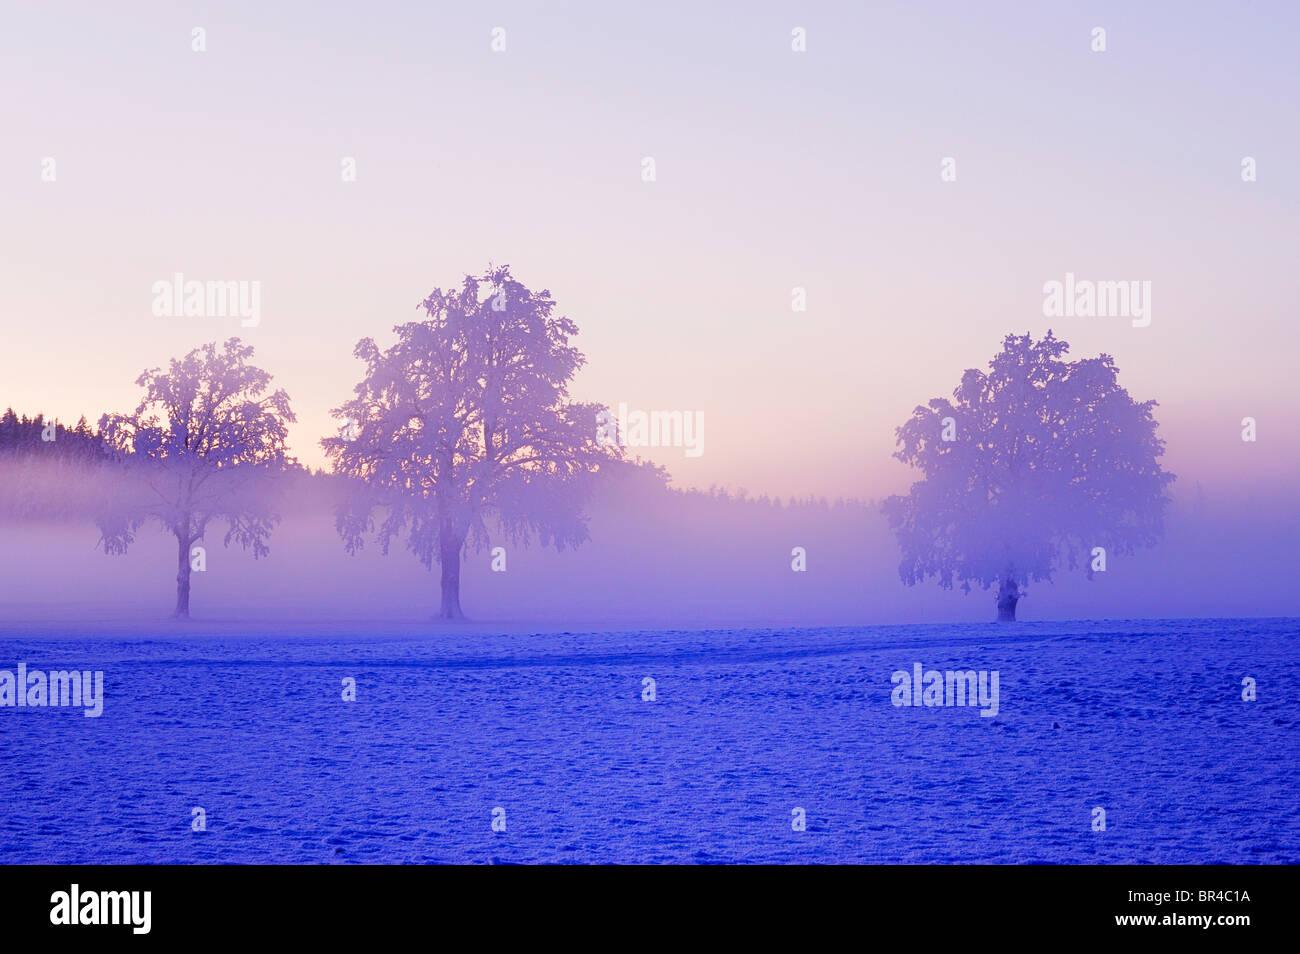 Paisaje invernal envuelta en la niebla, Horben, Aargau, Suiza, Europa Imagen De Stock